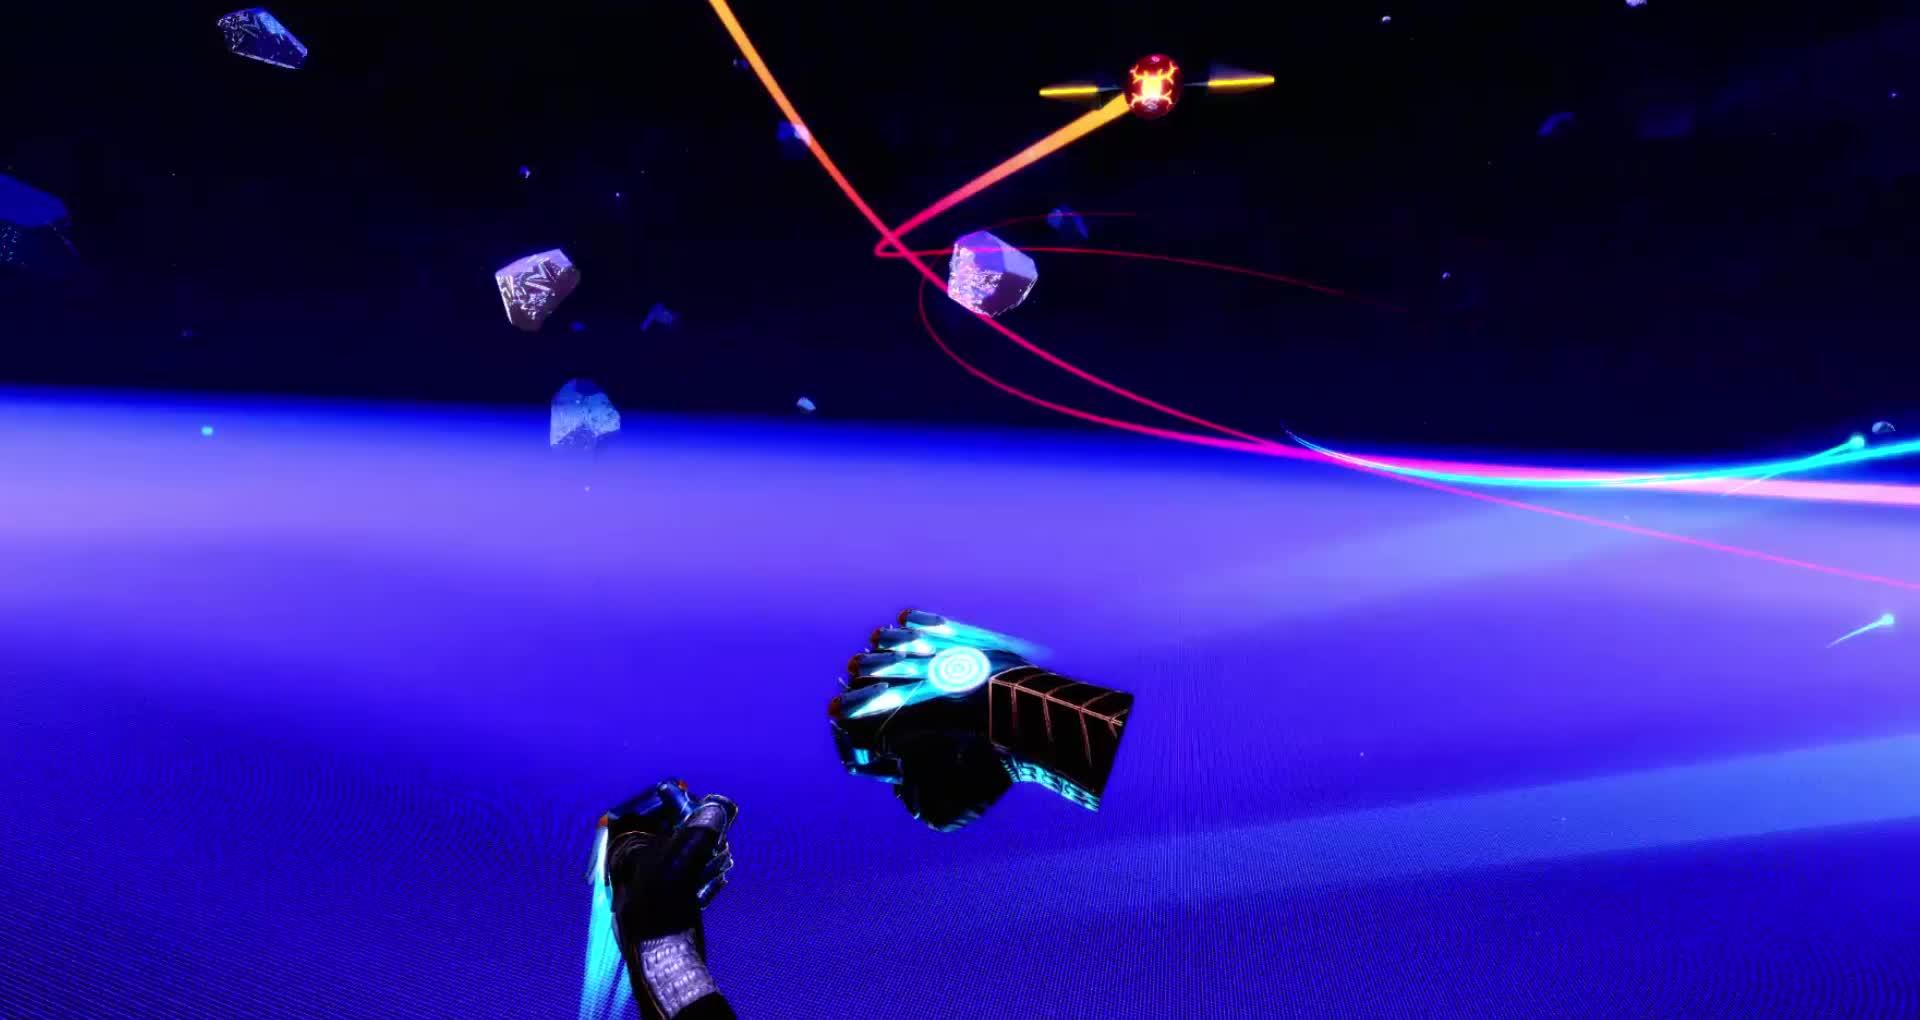 gaming, virtual reality, vr, Airborn VR - Guns GIFs